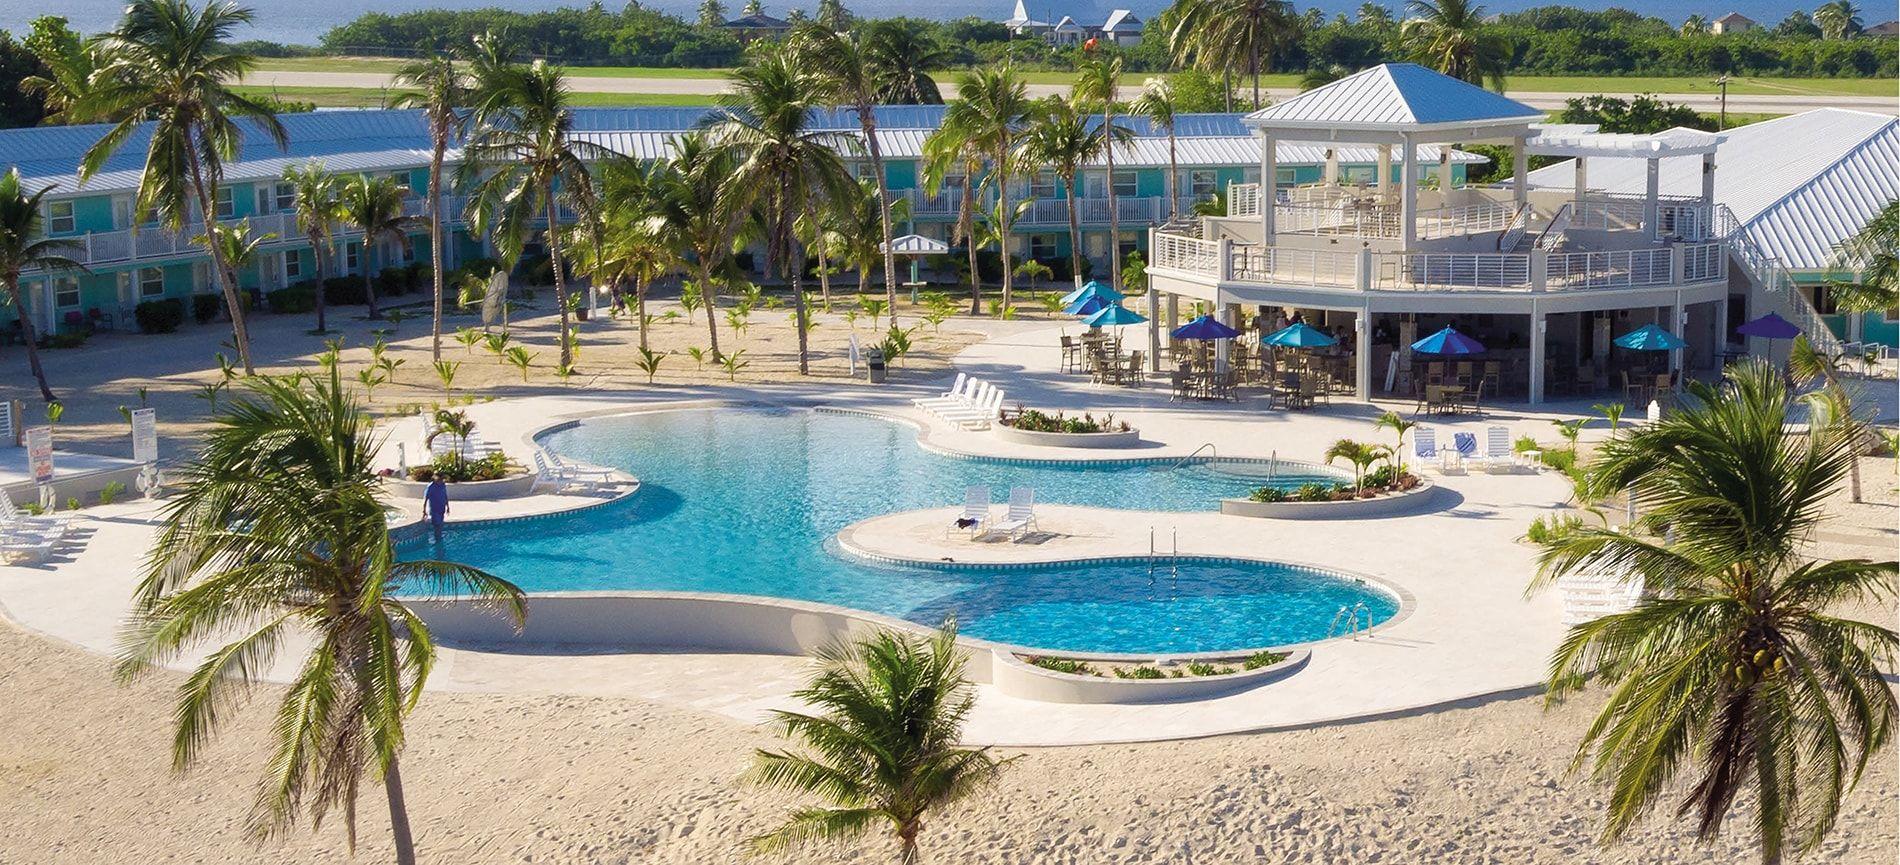 Resort Report: Cayman Brac Beach Resort | Caradonna Adventures